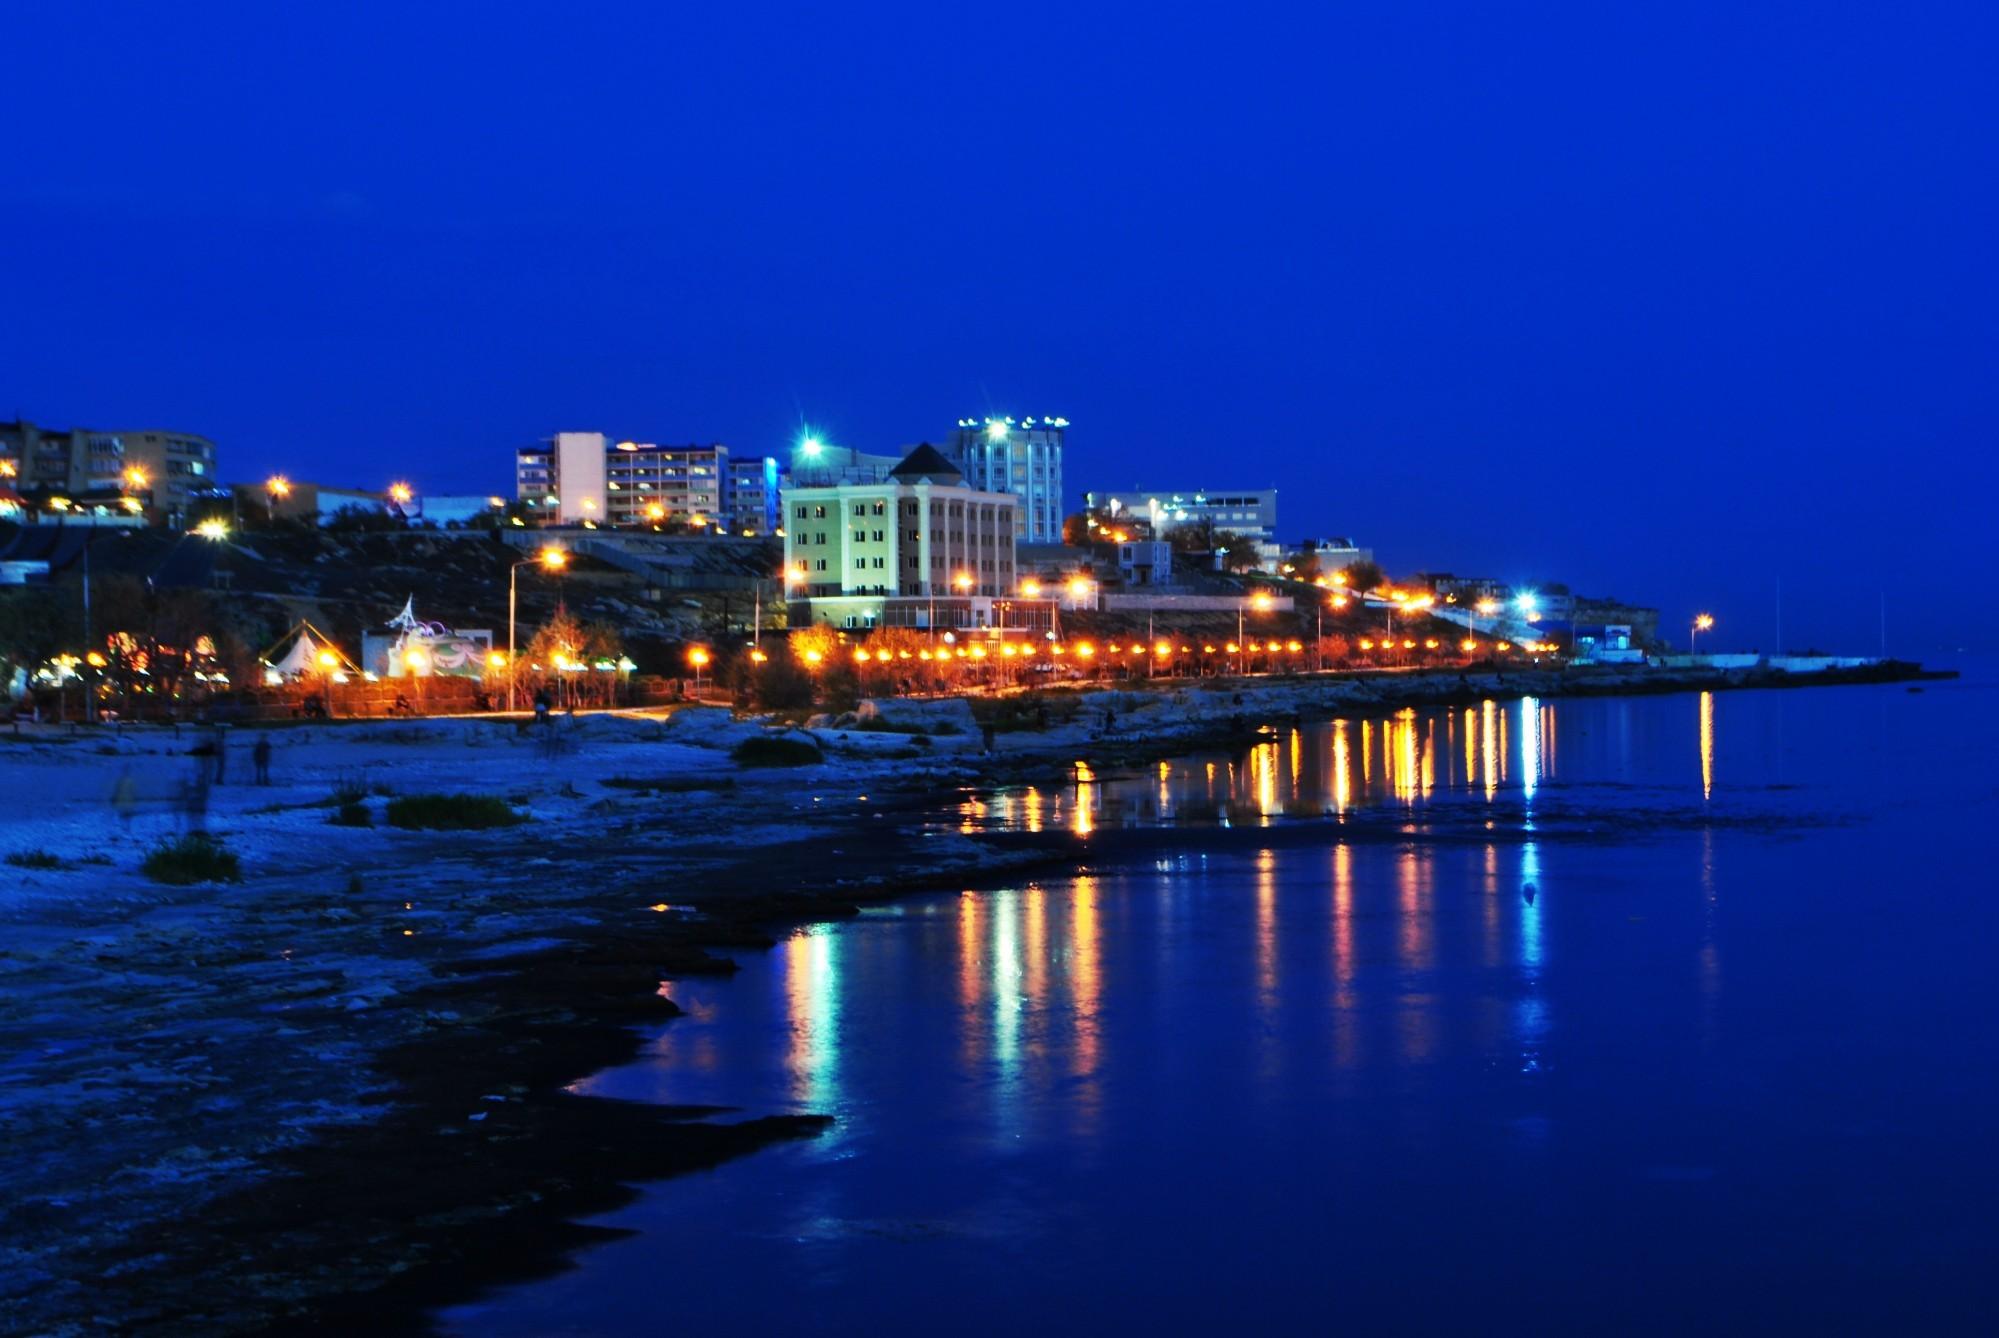 город актау казахстан фото пацан